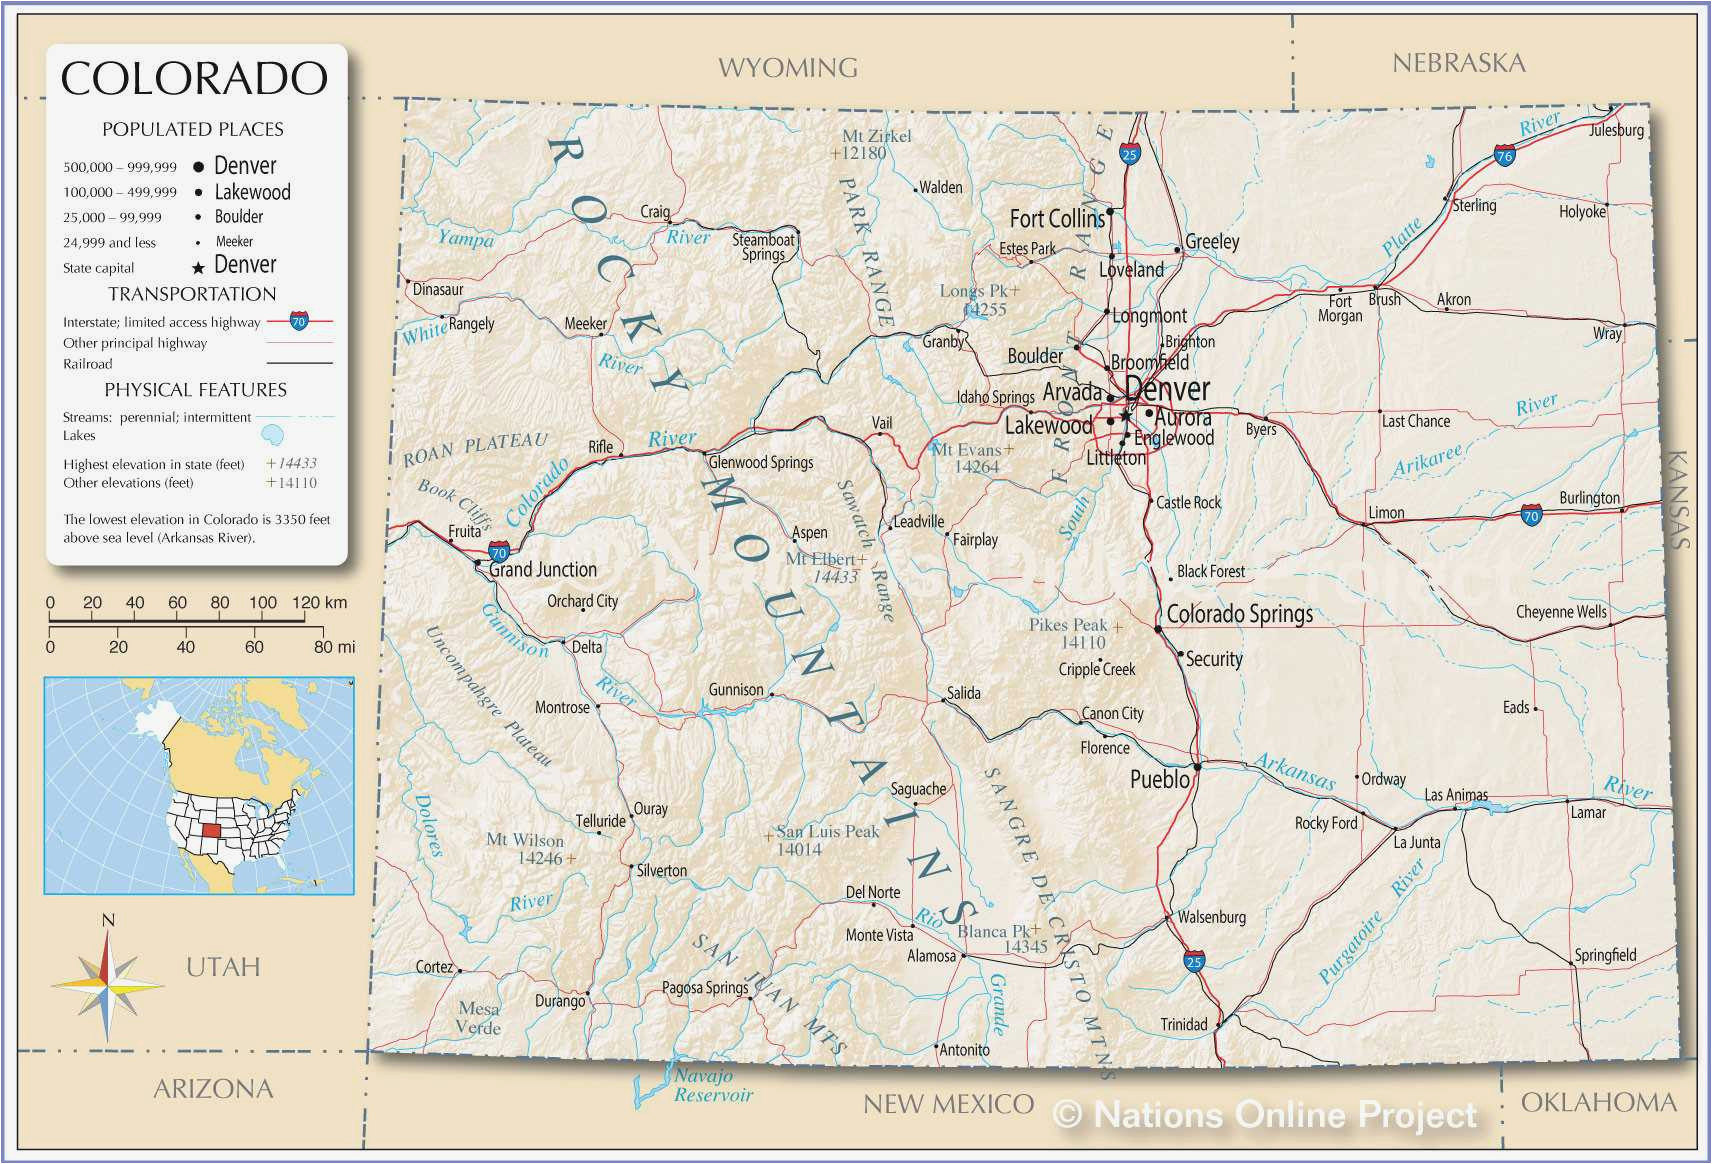 Wyoming Ohio Map | secretmuseum on cities in terrebonne parish, cities missouri map, cities in montana map, cities in fulton county ga, cities in kern county, cities in san diego county map, cities in southern maine, cities in utah map, cities in united states map, cities in la county, cities in northern colorado, cities in mt, cities in north carolina map, cities idaho map, cities in new york map, cities in western kentucky, cities in wisconsin map, cities in nevada map, cities in washington map, cities in new jersey map,